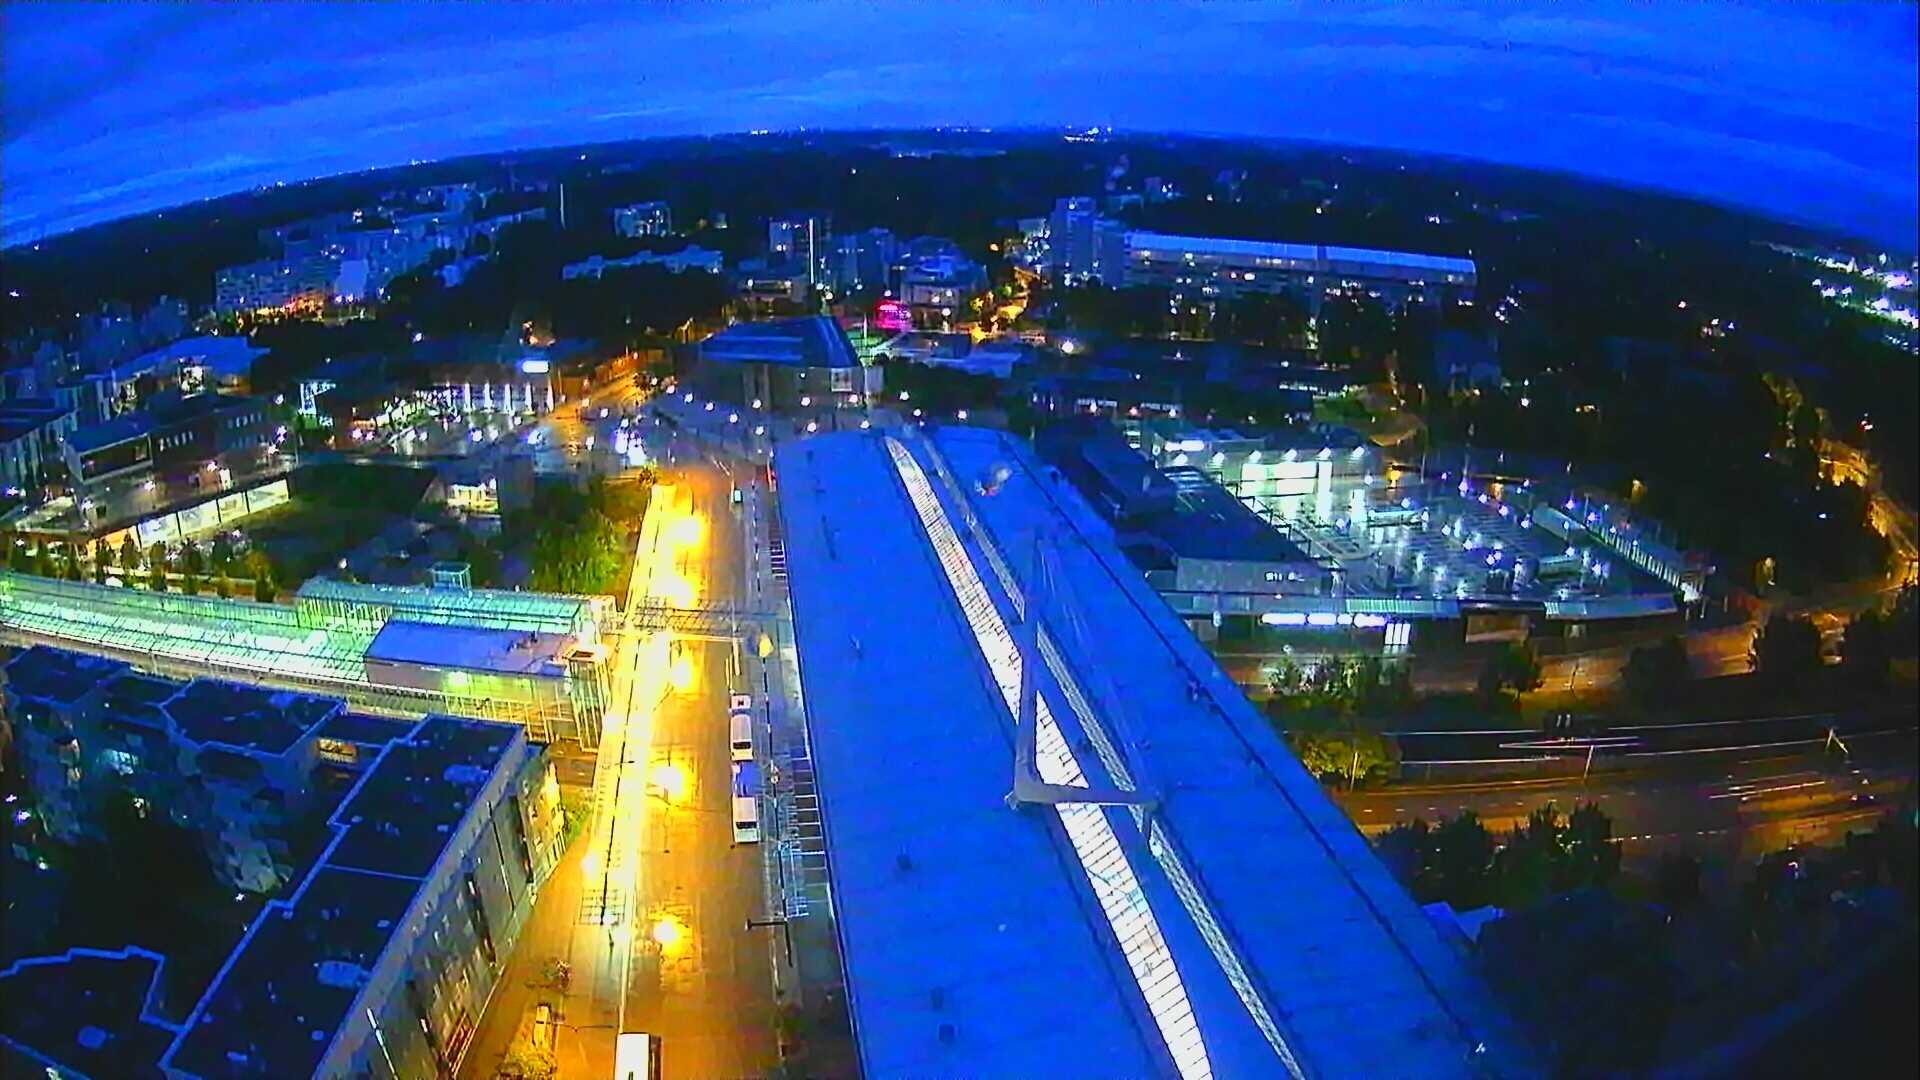 Helsinky - Vuosaari